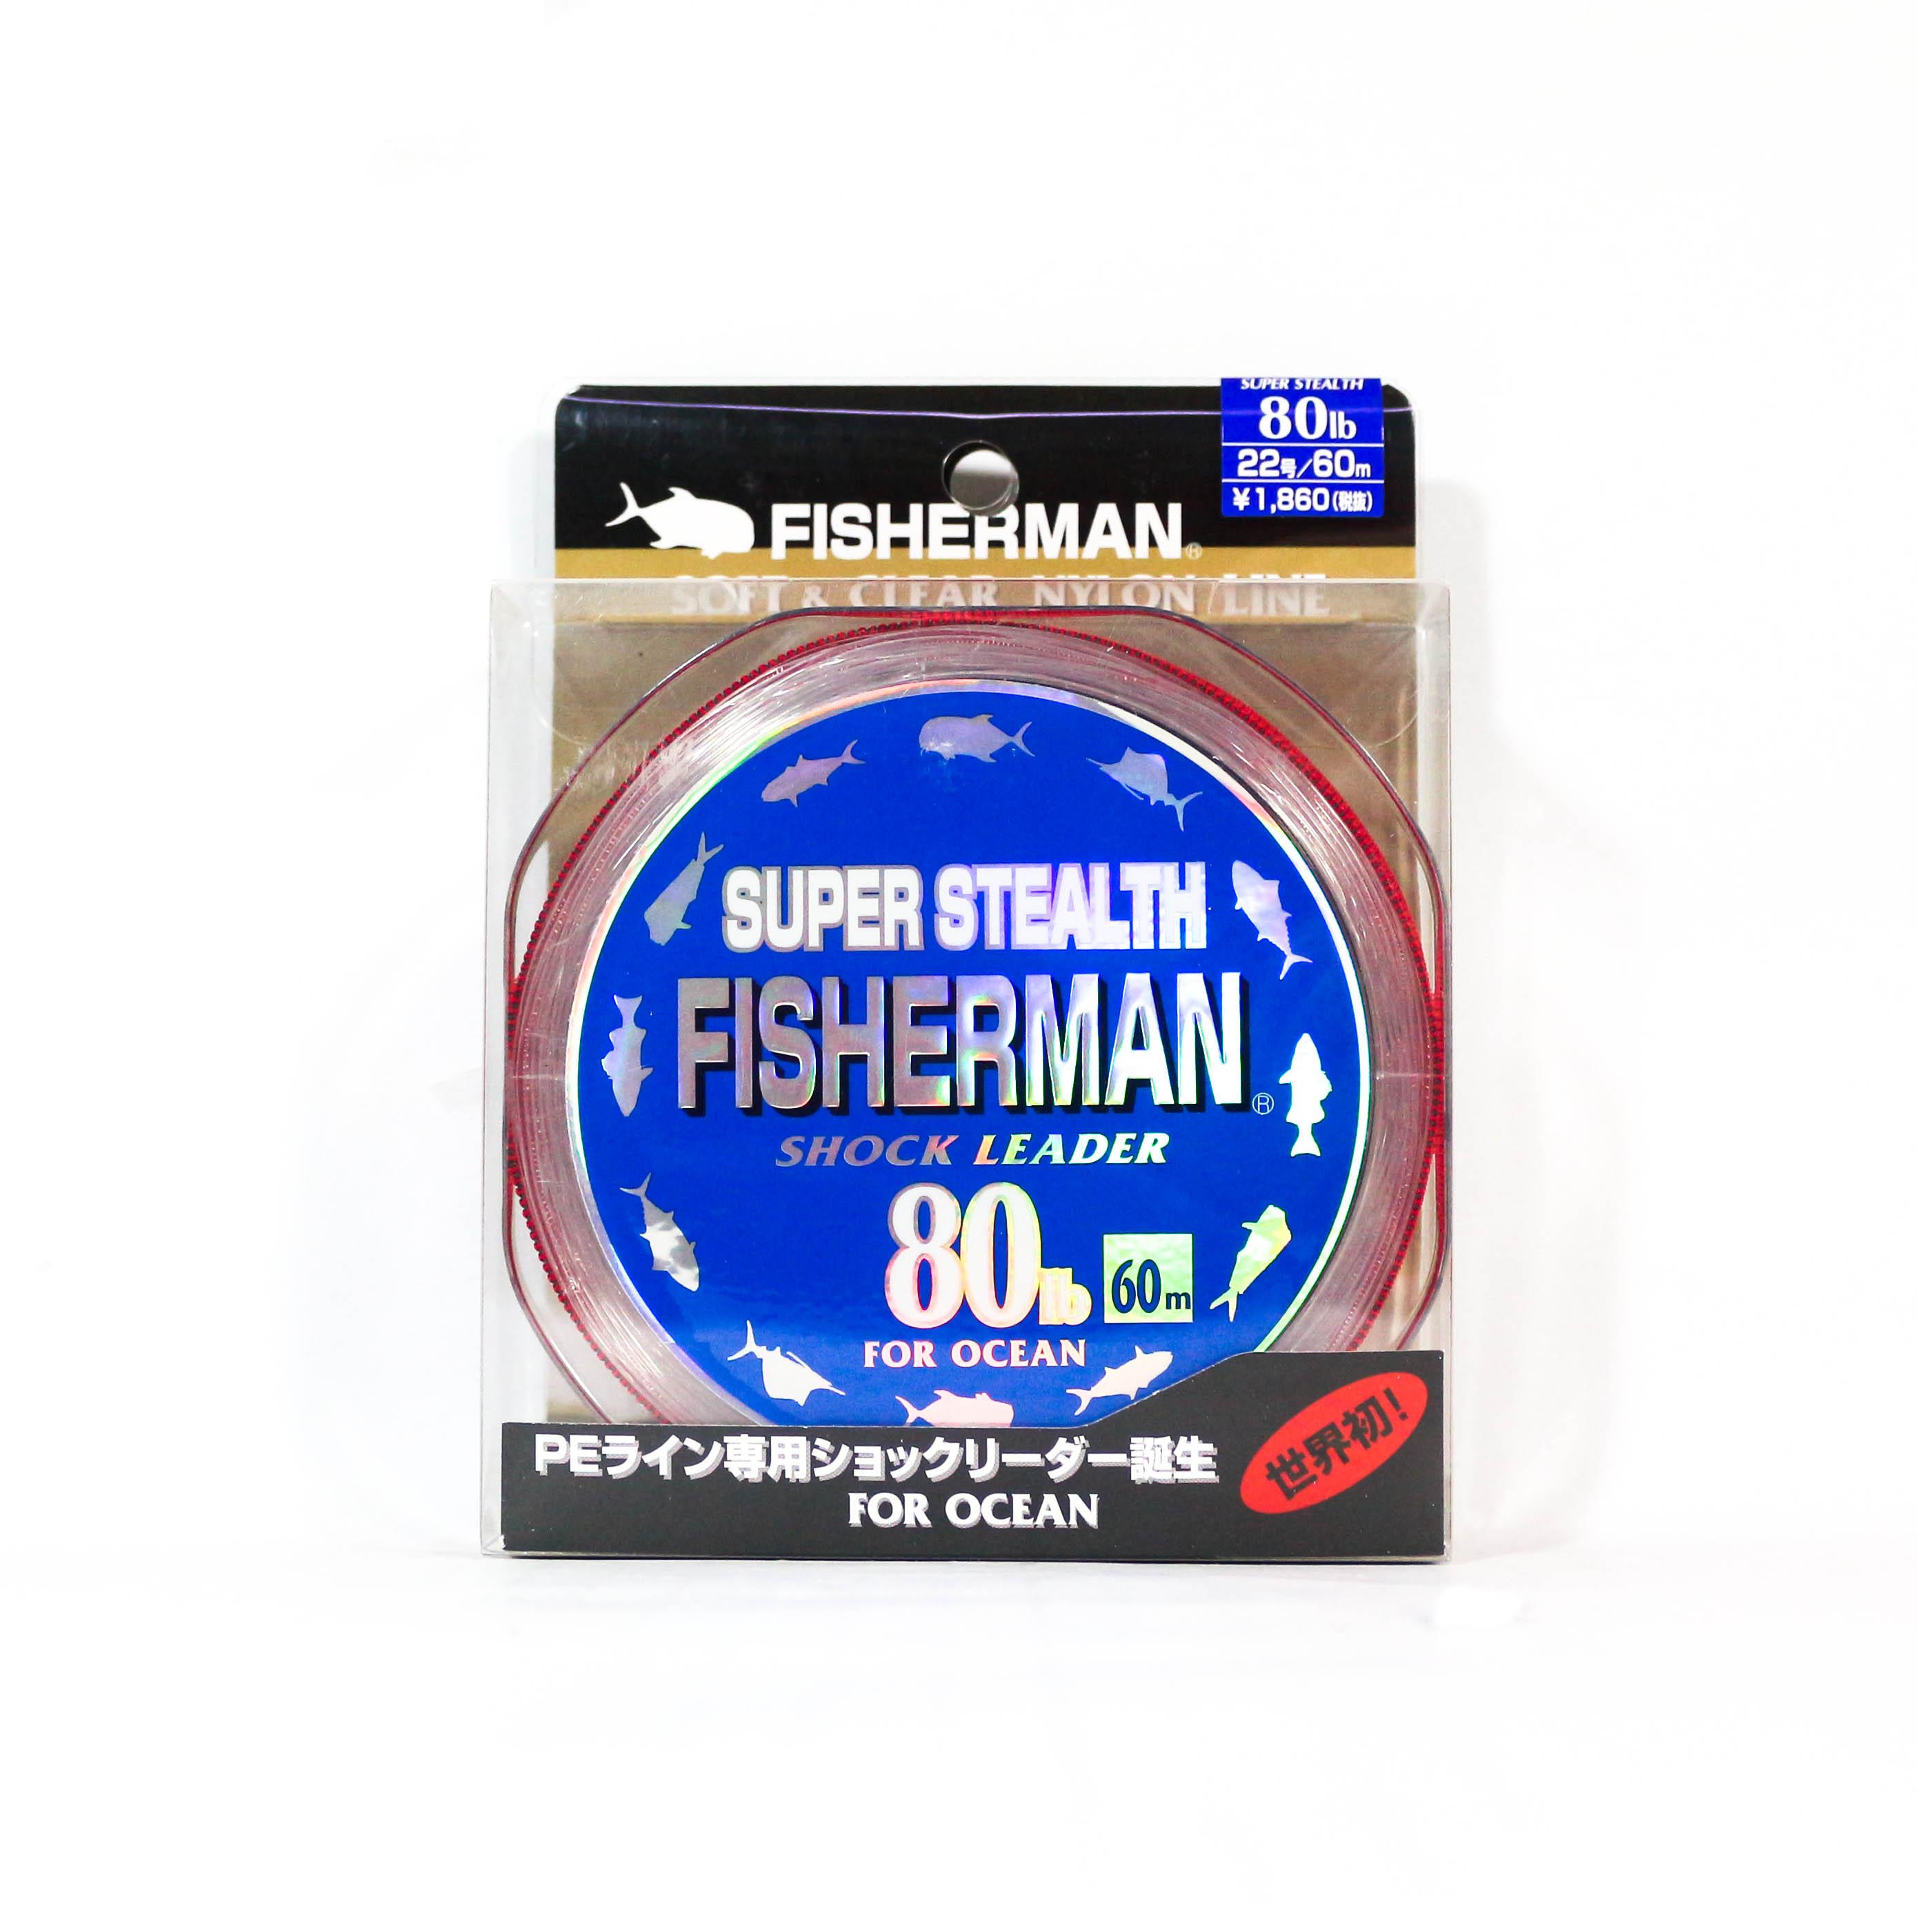 Fisherman Super Stealth Nylon Shock Leader 80 lb x 60 meter (0030)